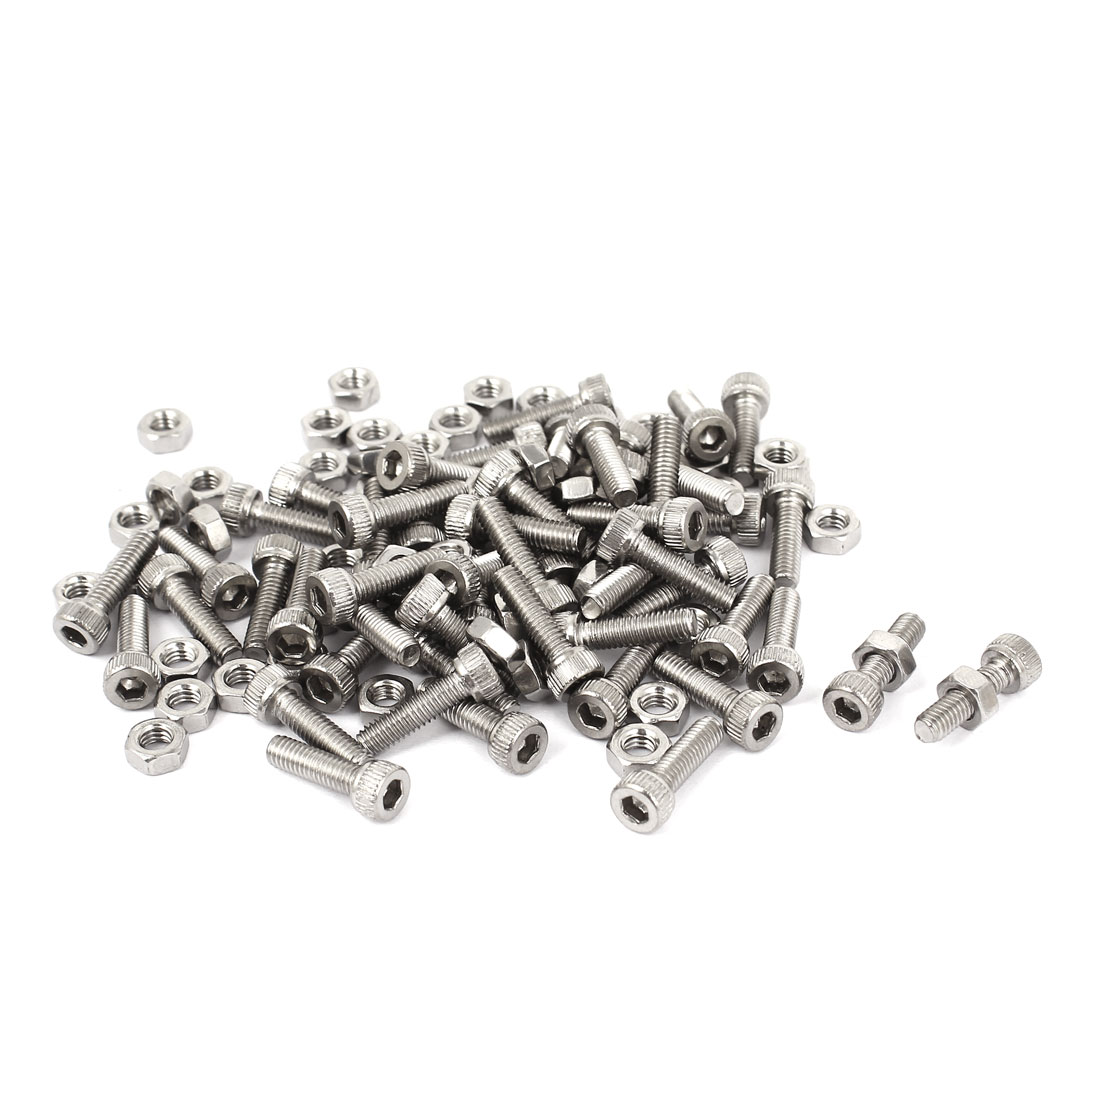 M4x14mm Stainless Steel Hex Socket Head Knurled Cap Screws Bolts Nut Set 50Pcs